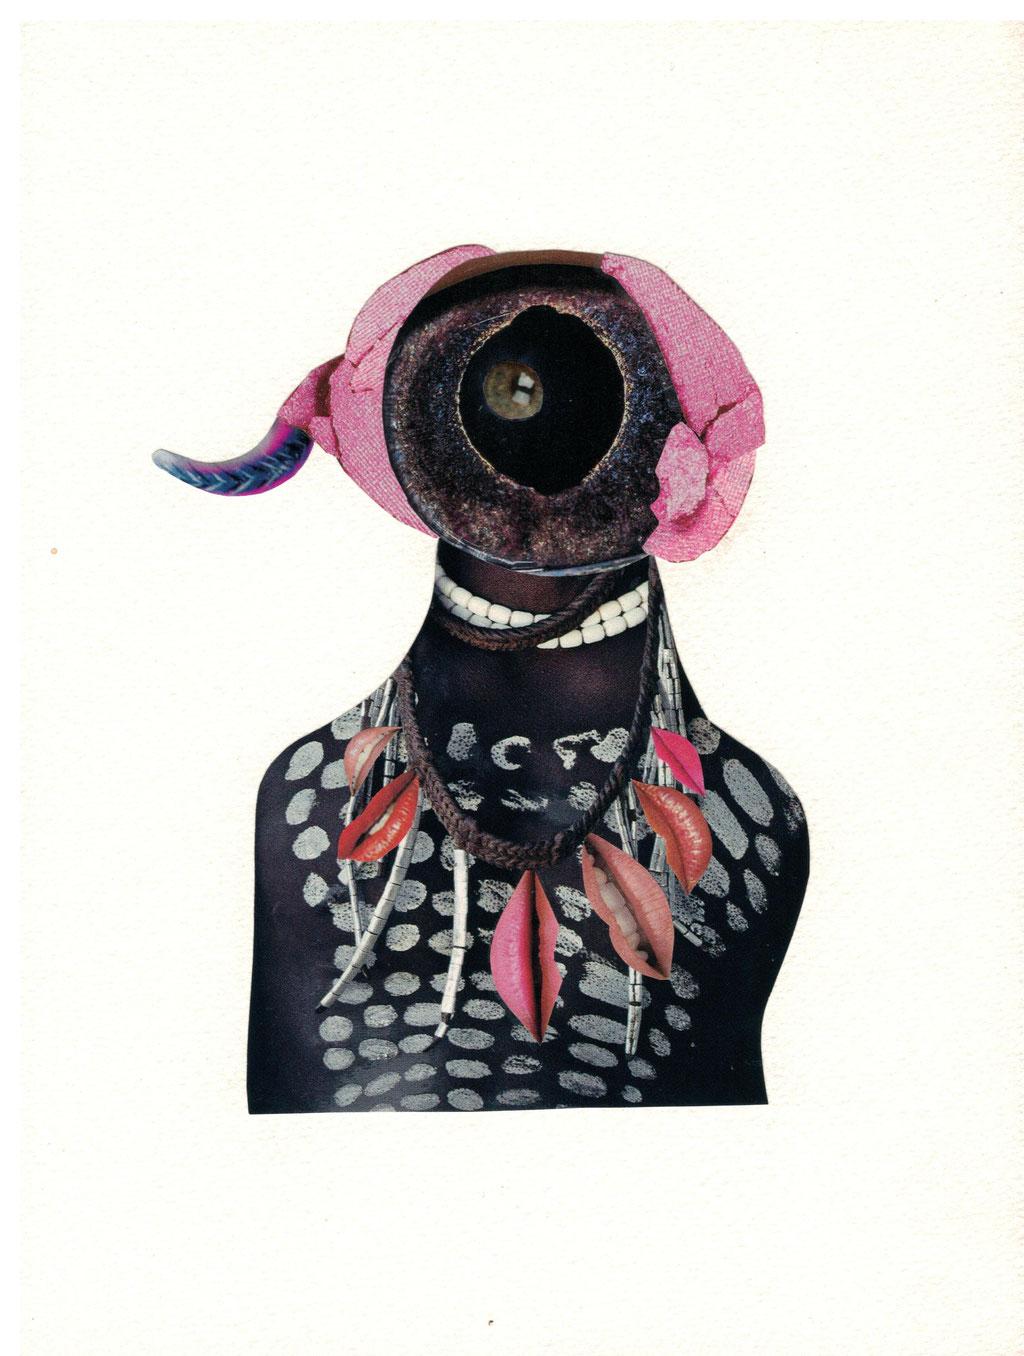 zonder titel, 15 x 20 cm, 2016